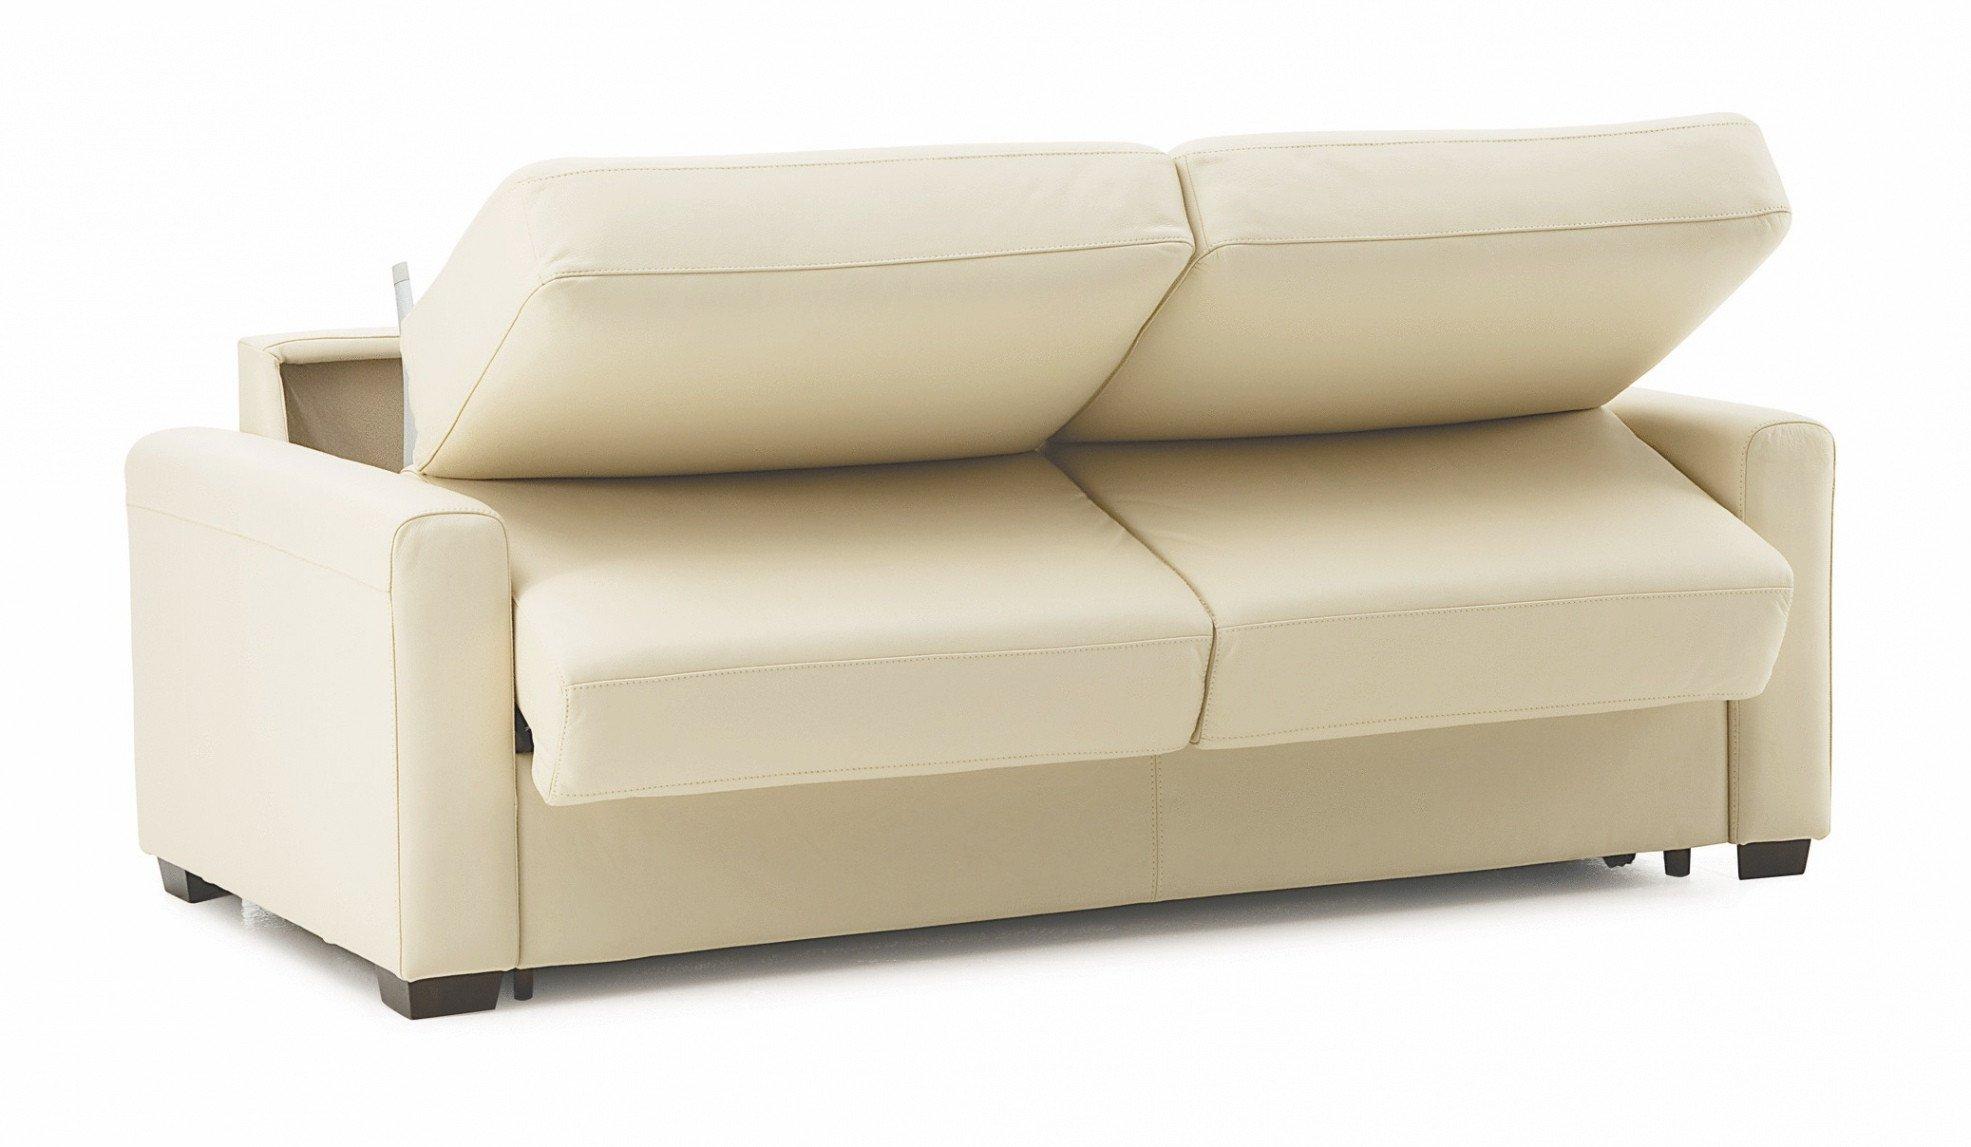 Most Comfortable Living Roomfurniture Fresh 100 [ Most fortable Living Room Furniture ] Most fortable Living Room Furniture Sets